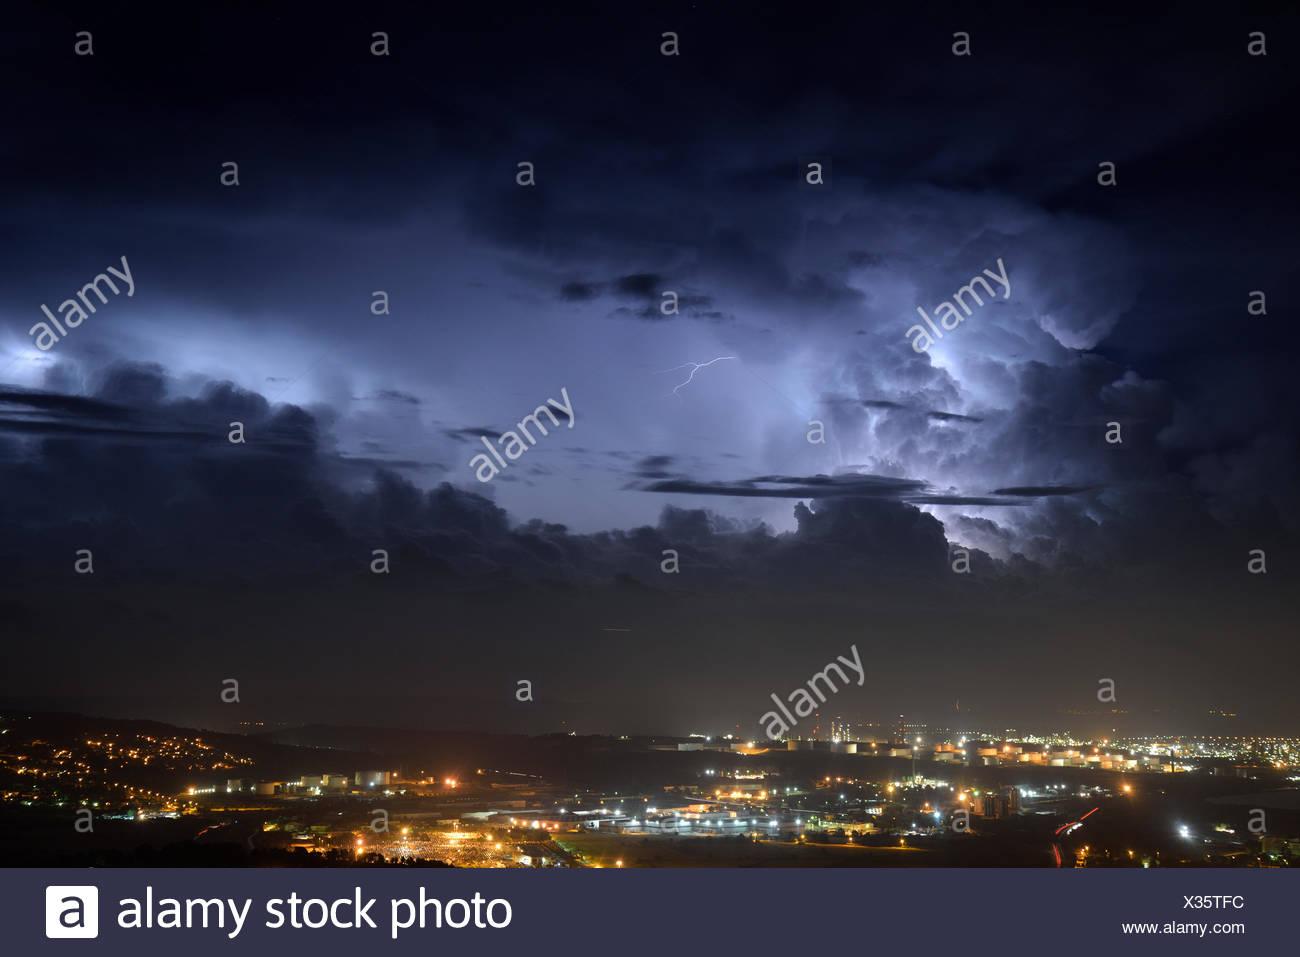 Cumulonimbus very electric and refineries - Etang de Berre - Stock Image